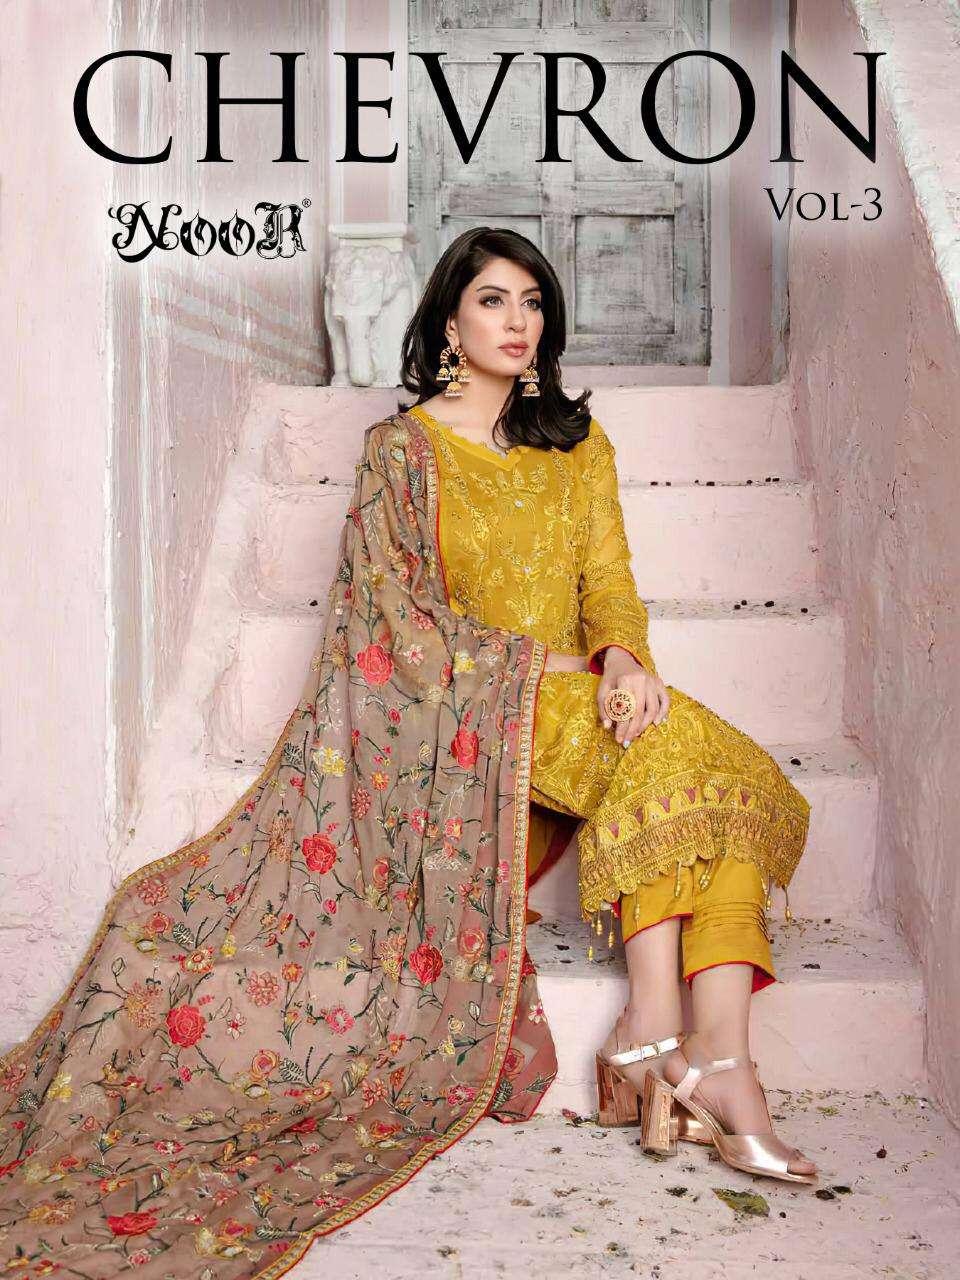 Noor Chevron Vol 3 Designer Pakistani Suit Catalog Wholesale Supplier